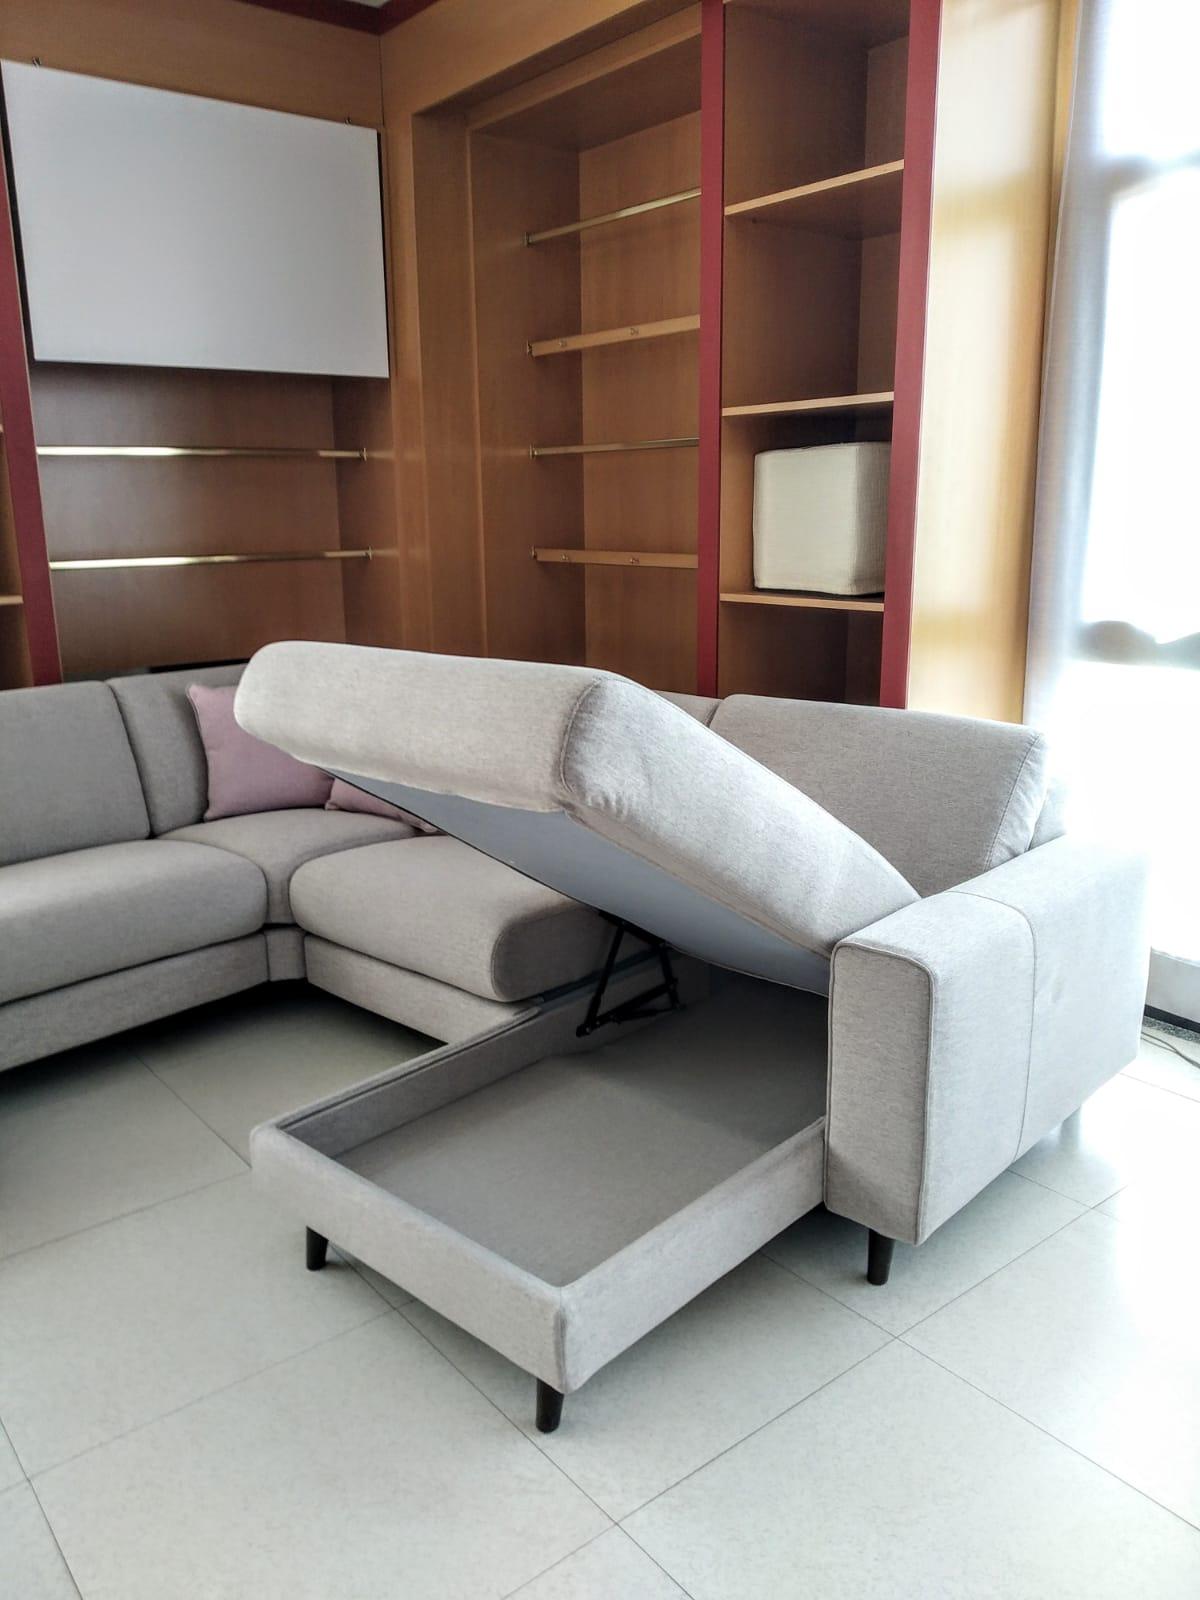 divano moderno cassano magnago varese - nuova tag